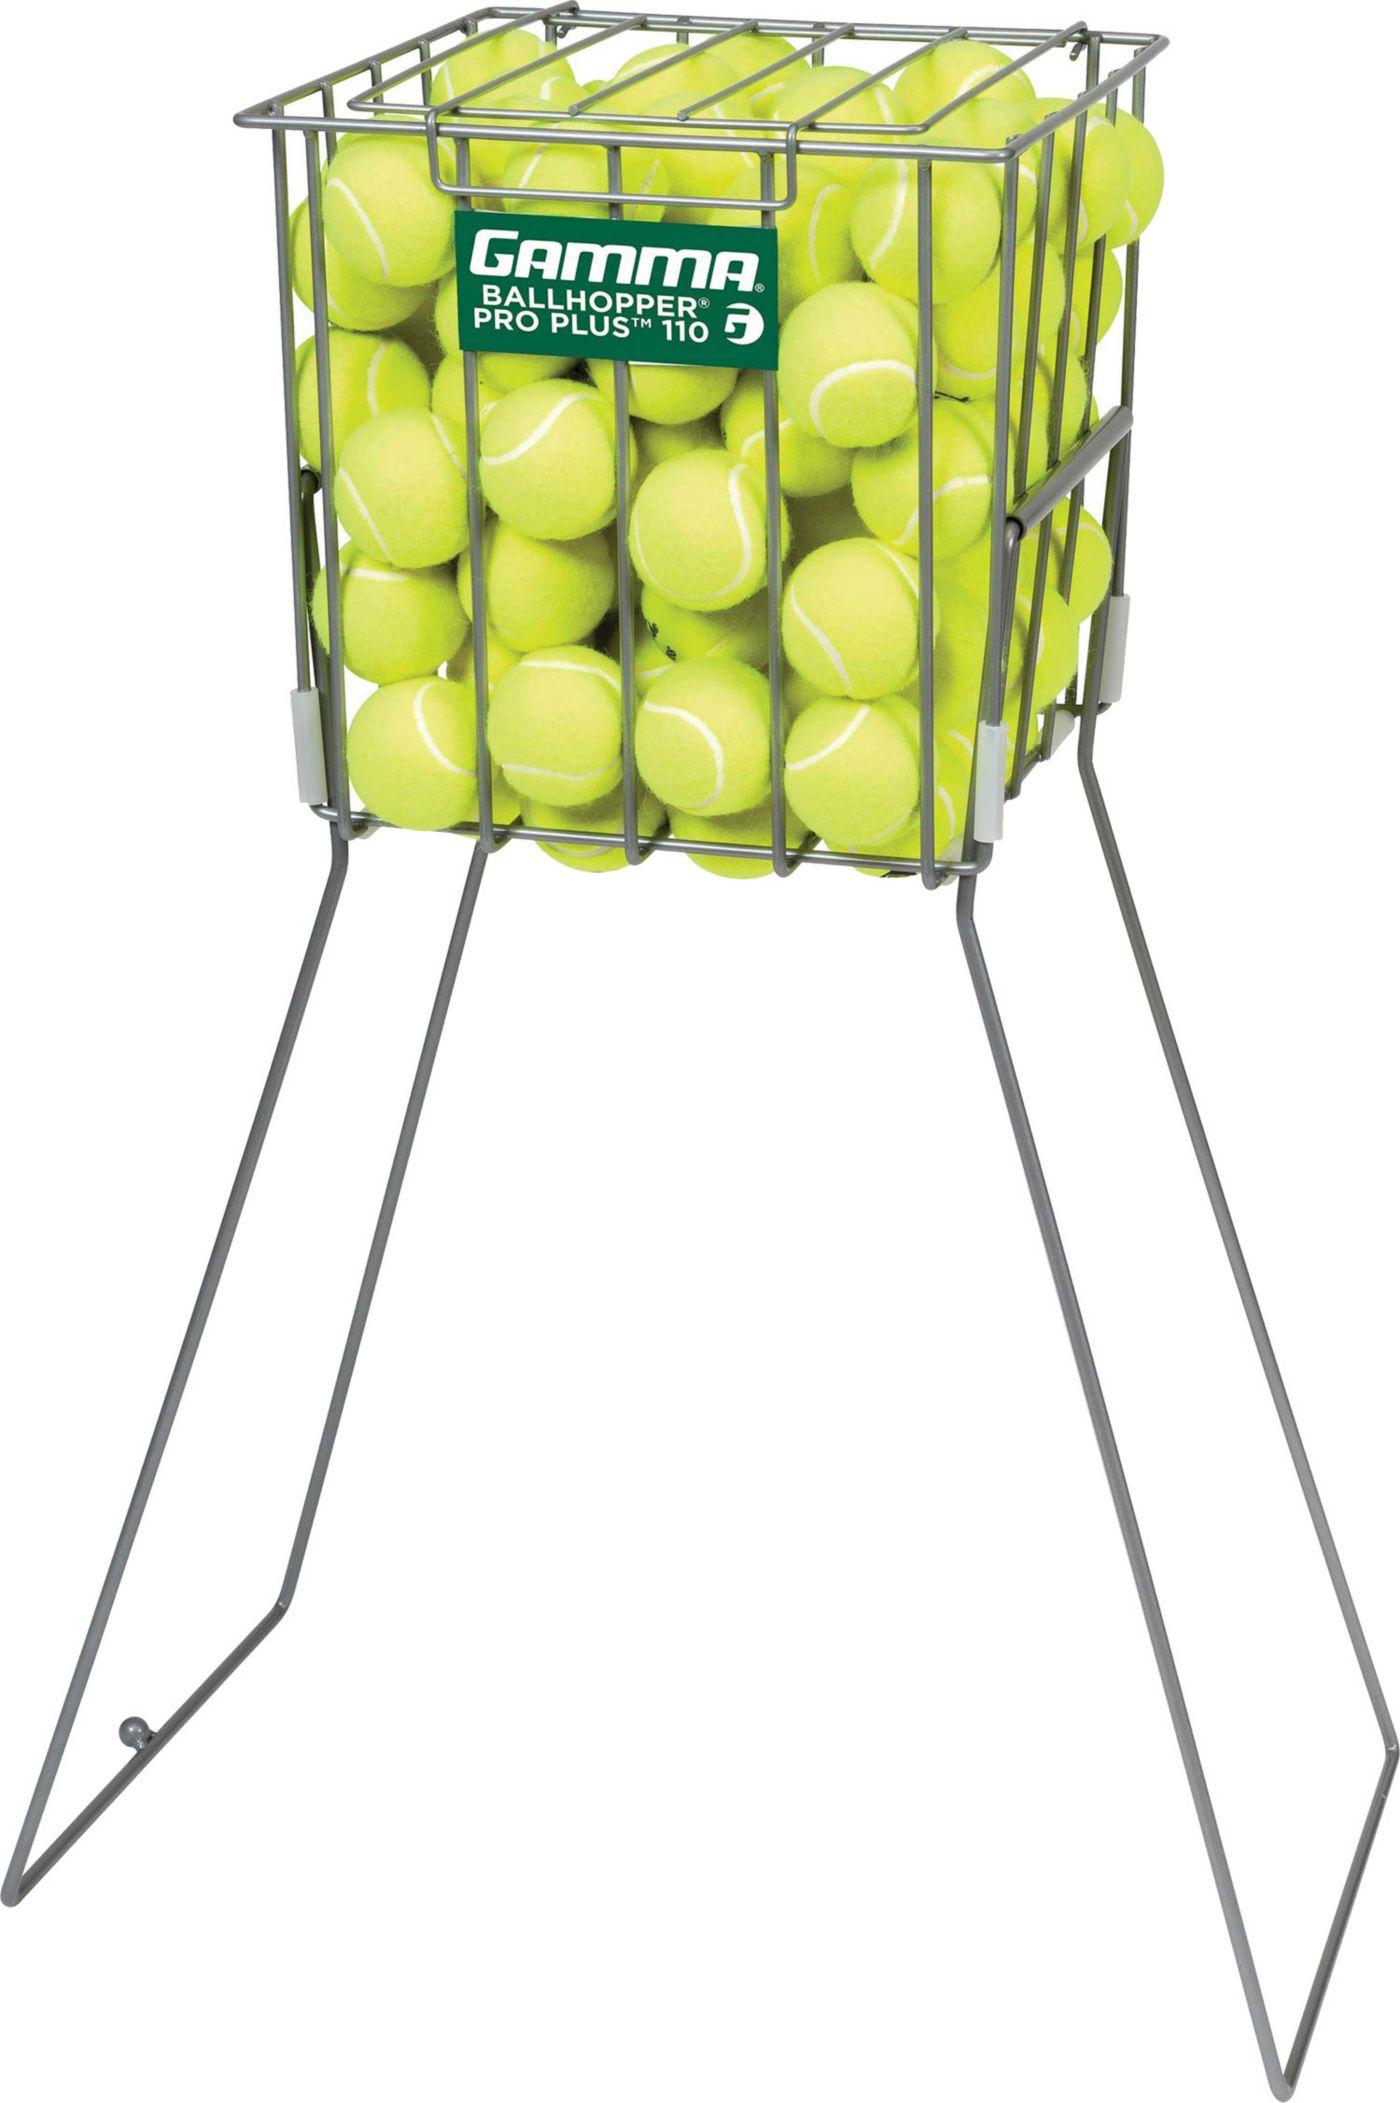 GAMMA Ballhopper Pro Plus 110